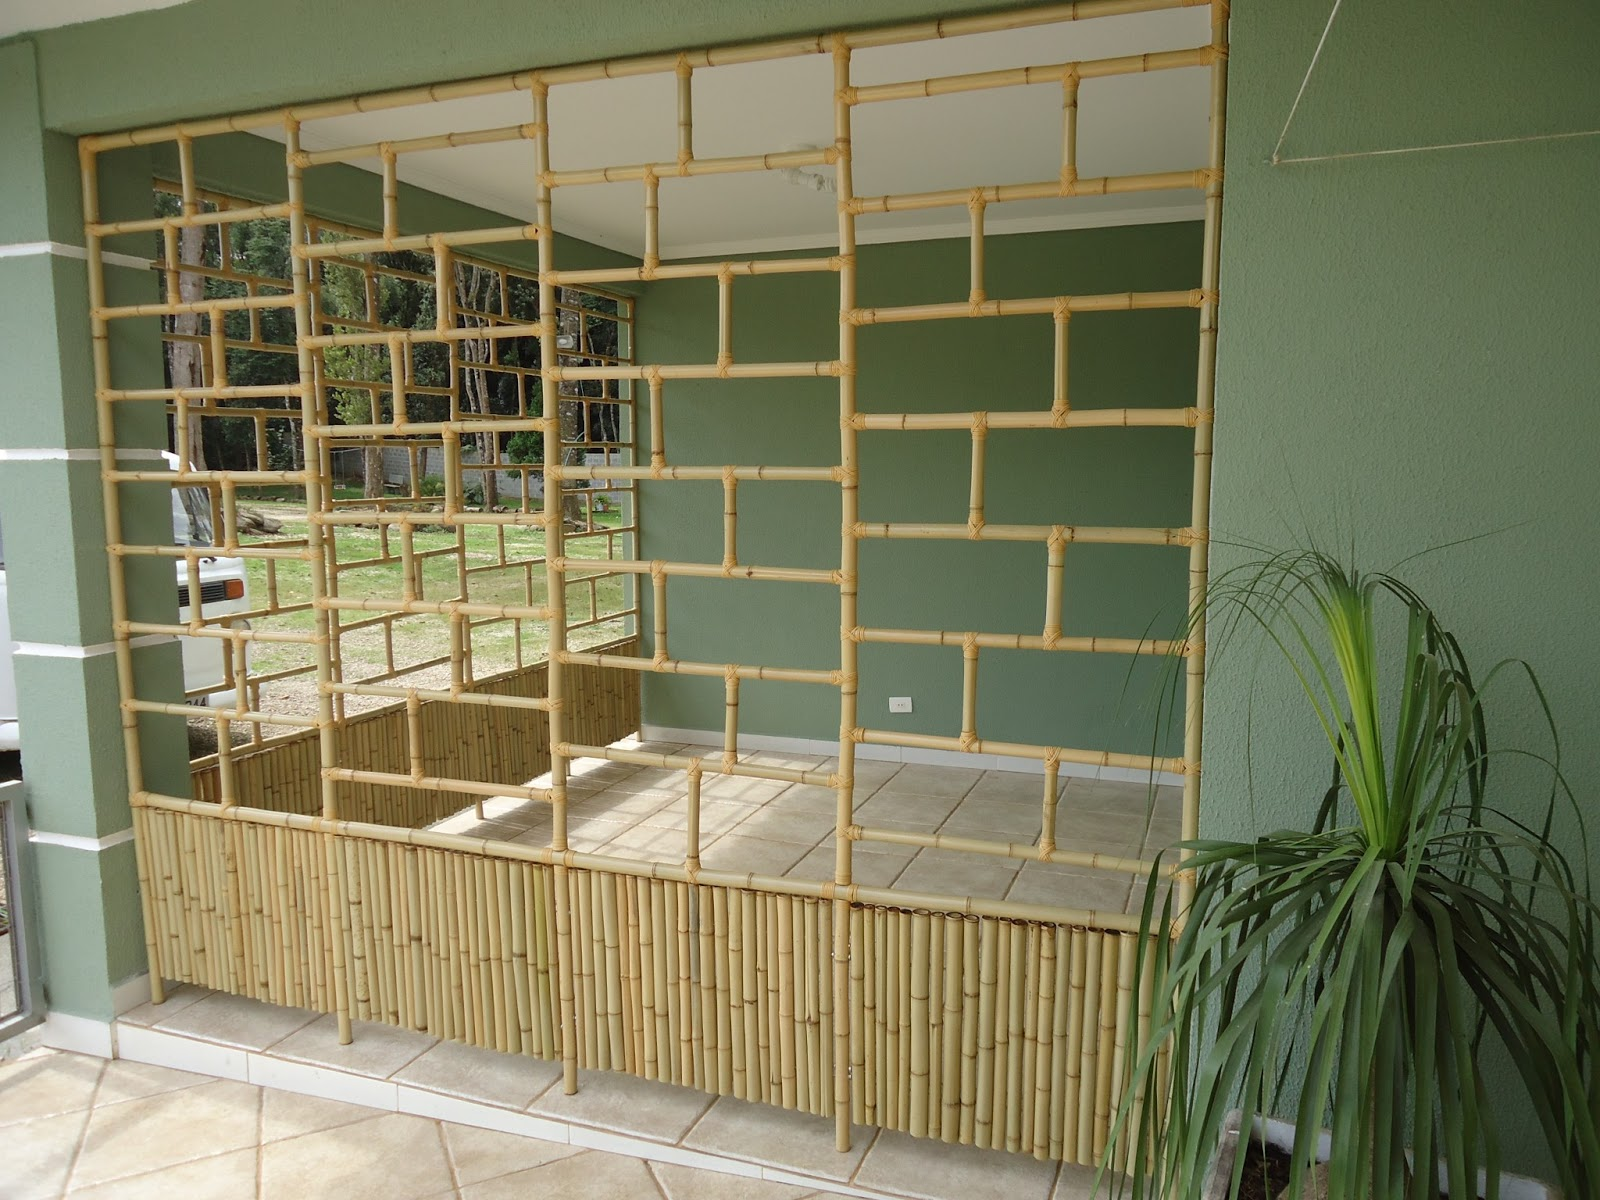 trelica bambu jardim : trelica bambu jardim:Vida Bambu – Curitiba – PR.: Estufa em Bambu